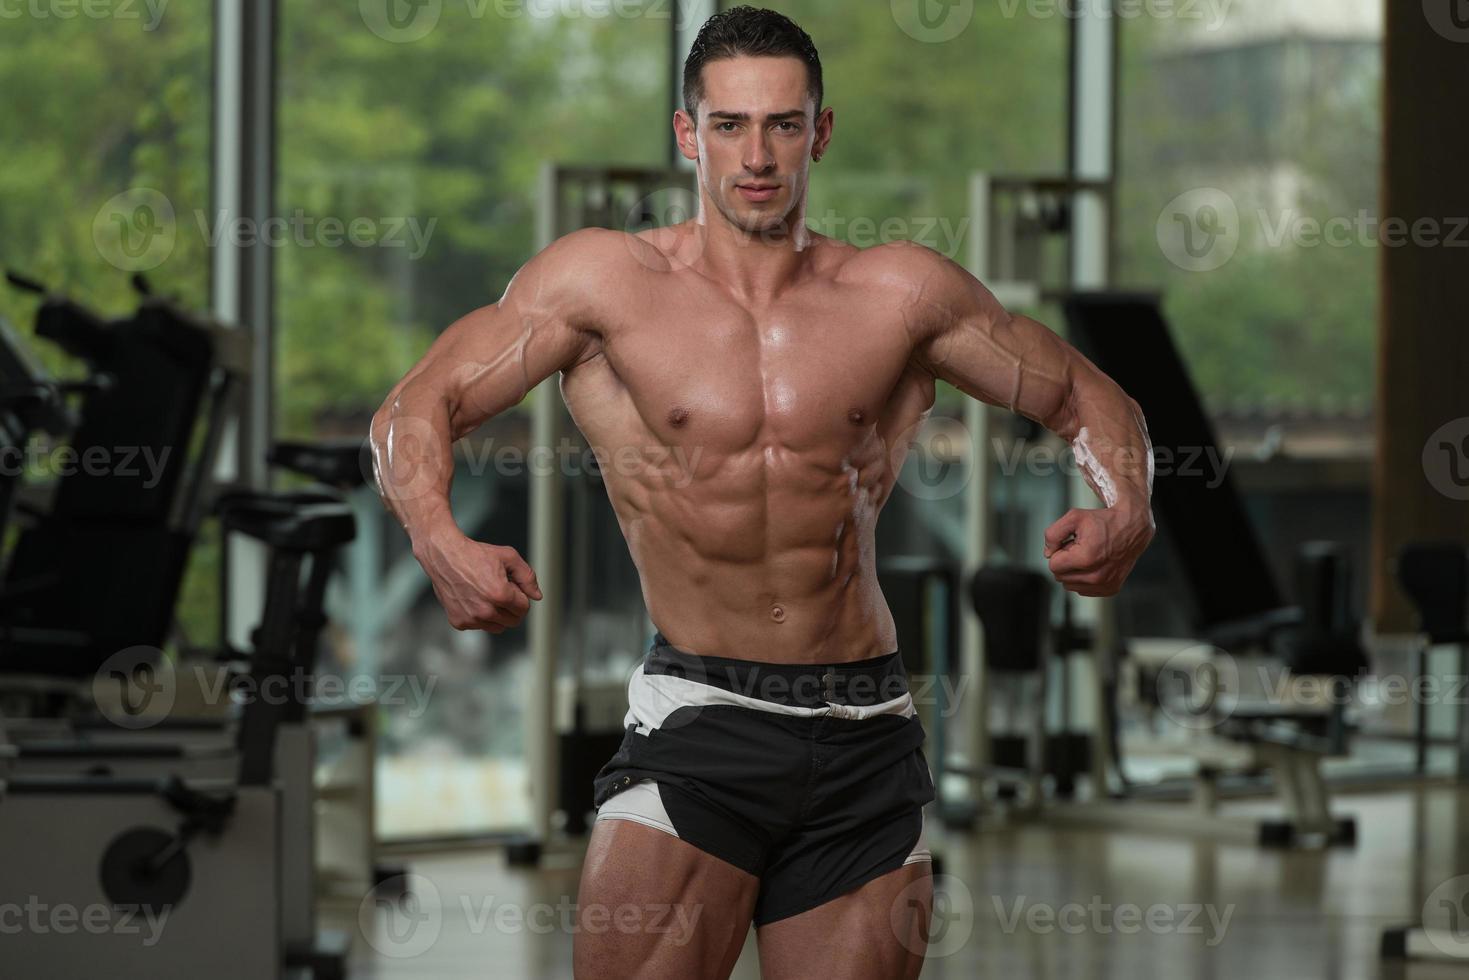 allvarlig kroppsbyggare som står i gymmet foto